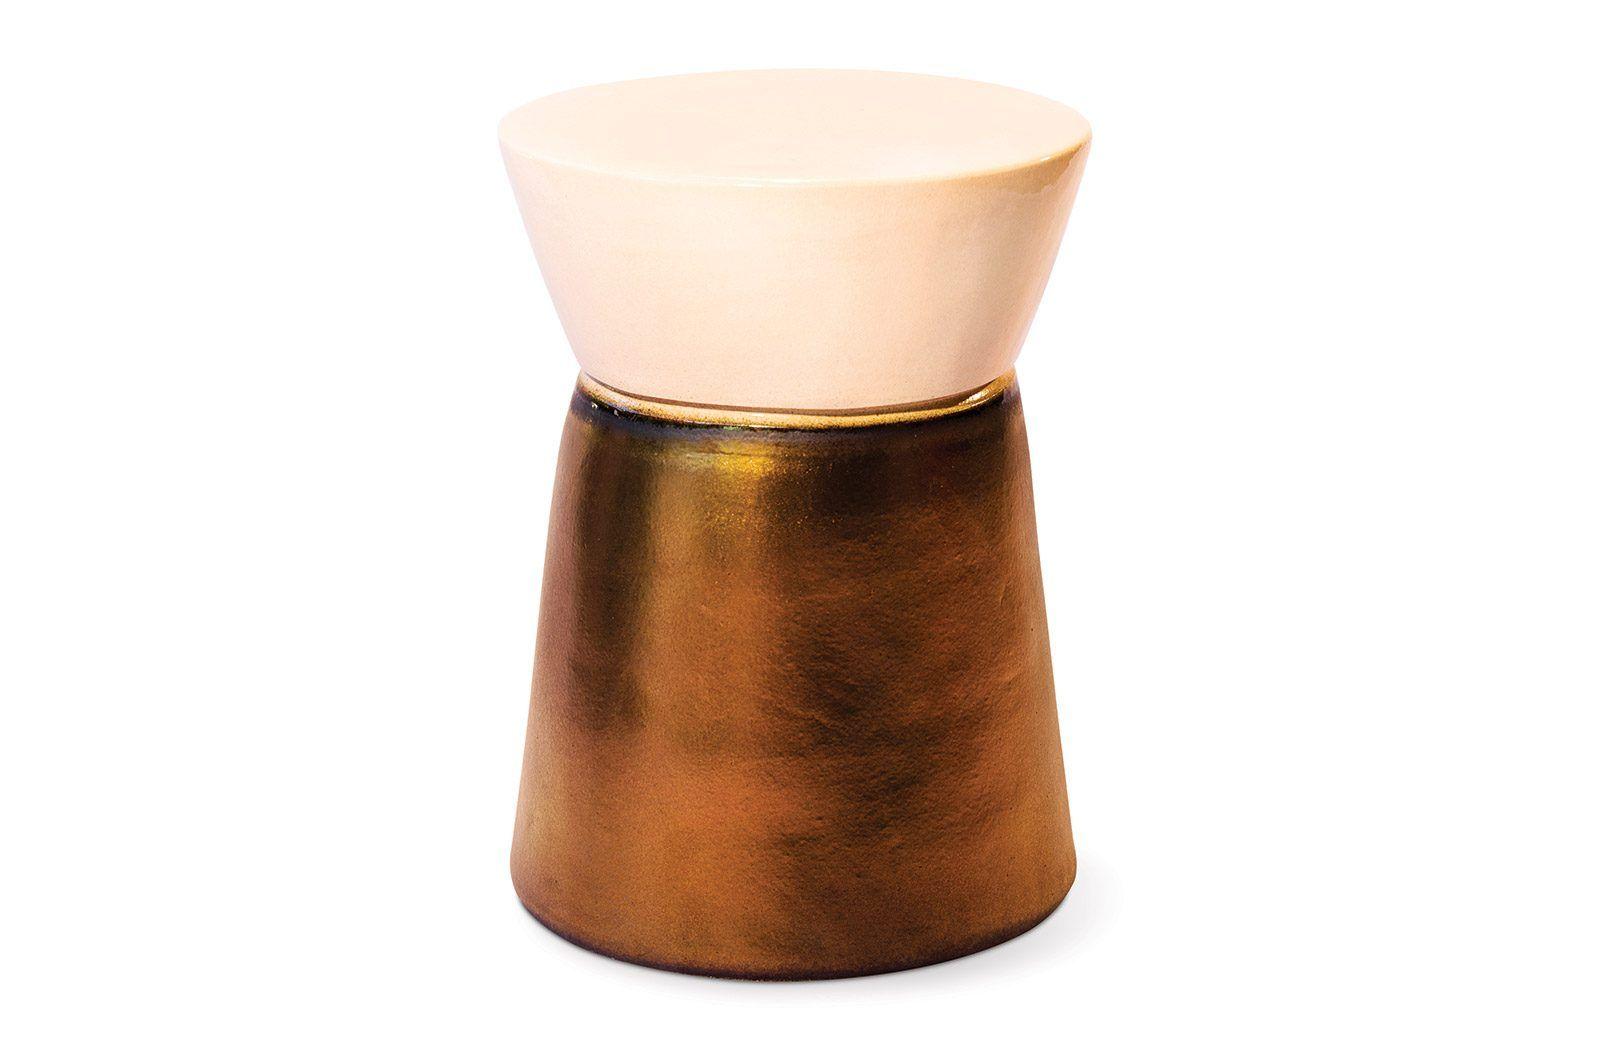 Ceramic Cork Stool Accent Table Seasonal Living Cork Stool Accent Stool Ceramic Furniture